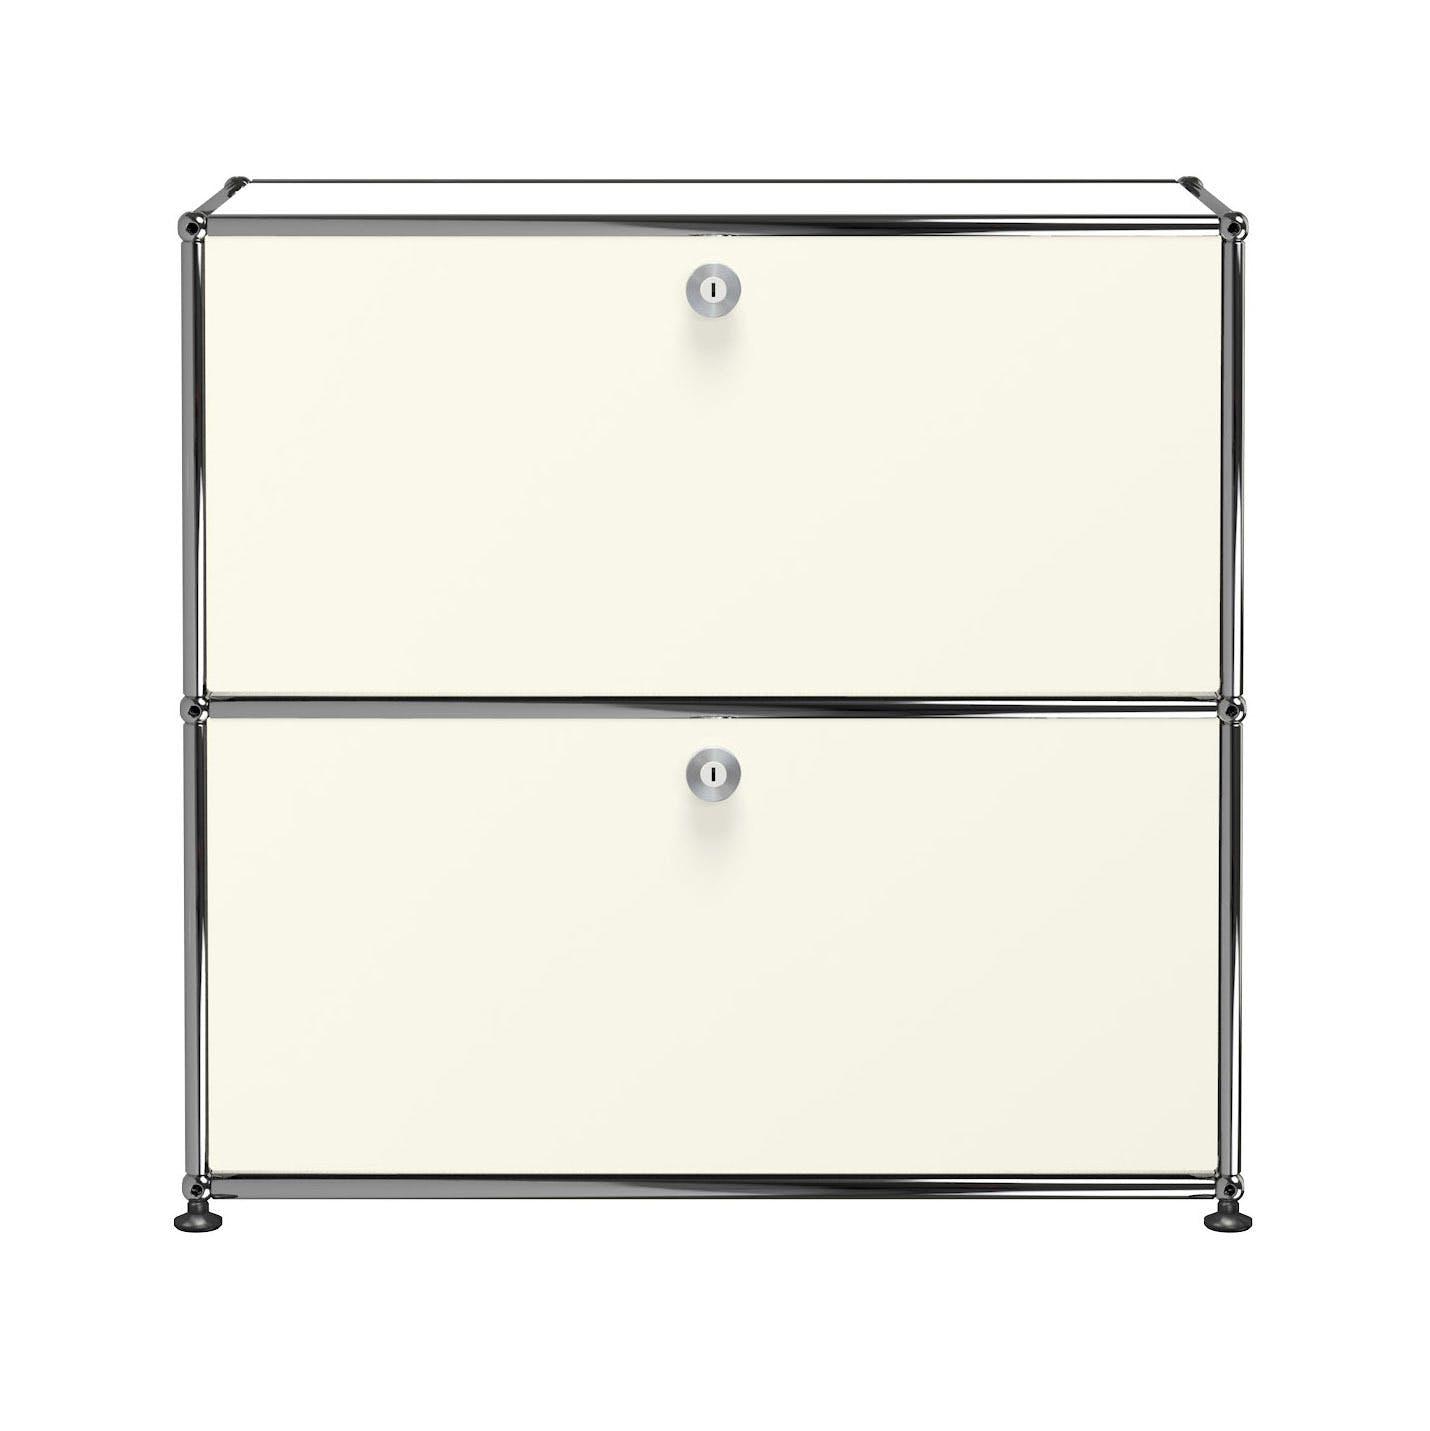 Usm-quick-ship-white-Haller-Storage-C1A18-white-haute-living